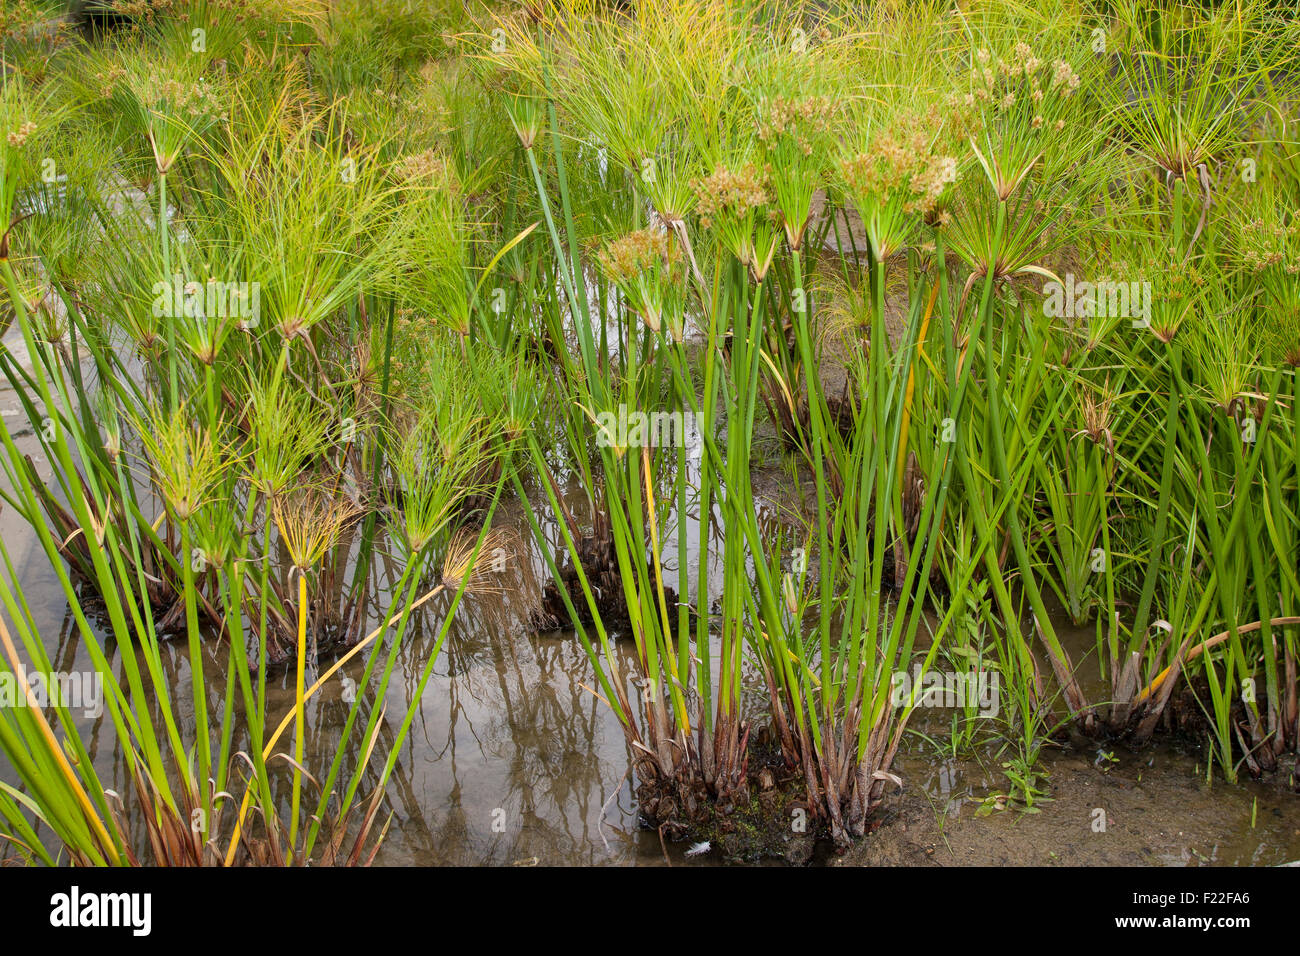 Papyrus sedge, paper reed, Indian matting plant, Nile grass, Echter Papyrus, Papyrusstaude, Zyperngras, Papier, - Stock Image